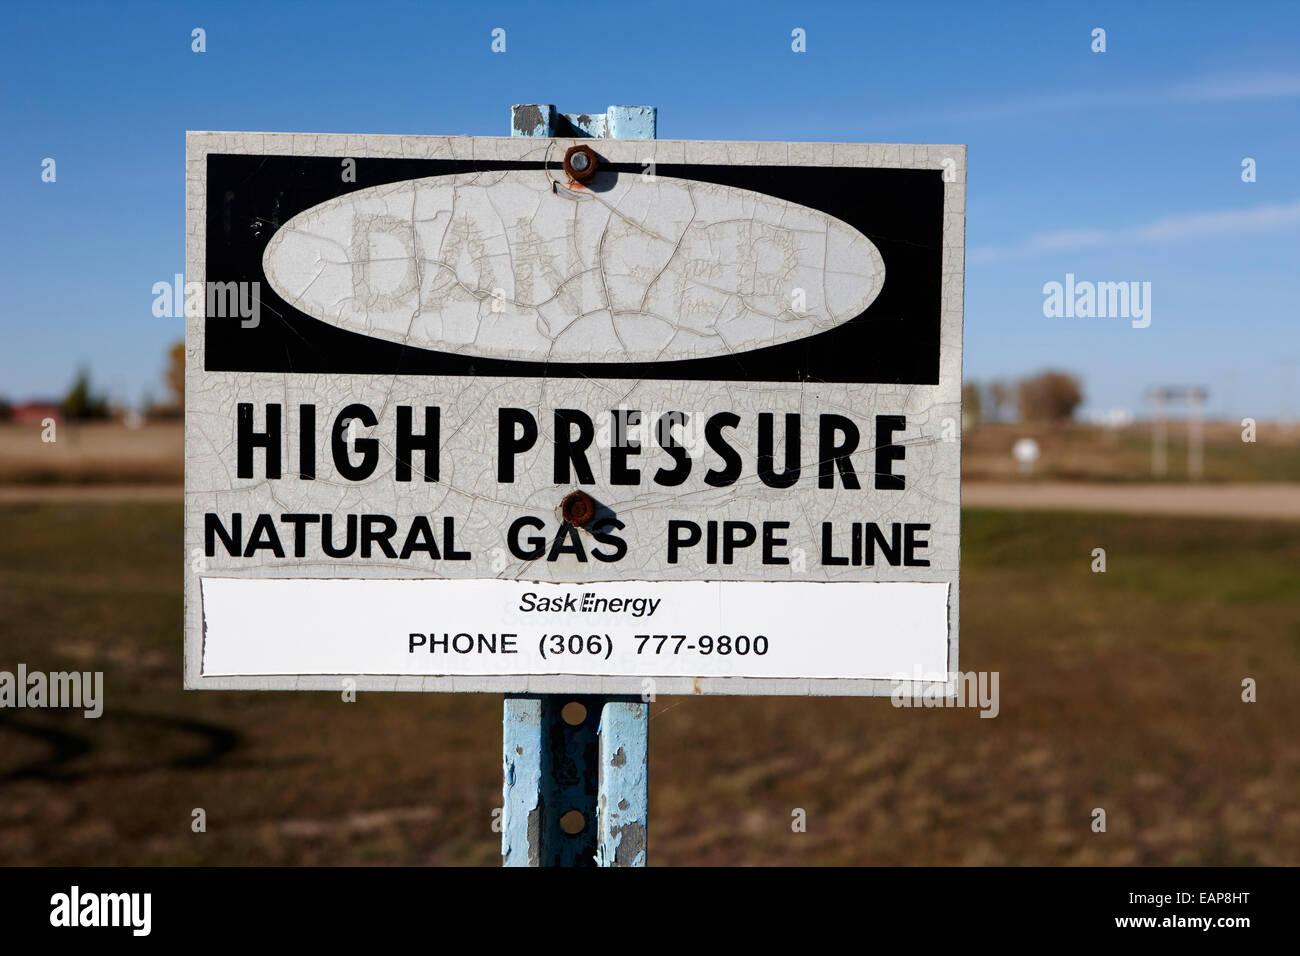 danger sign for high pressure natural gas pipeline underground bengough Saskatchewan Canada - Stock Image